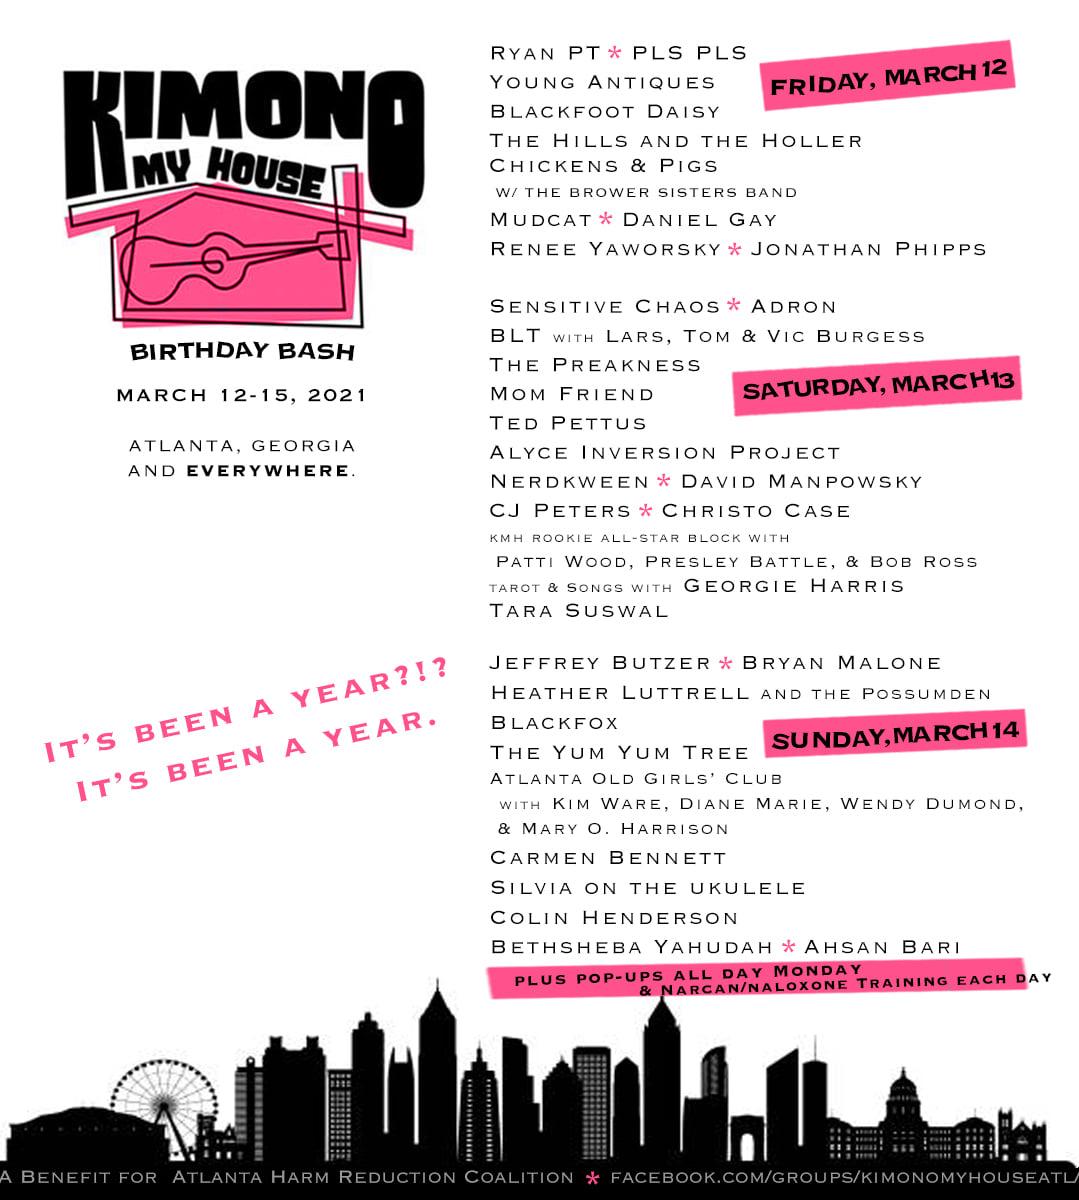 Kimono-My-House-Birthday-Bash-Alyce-Inversion-Project